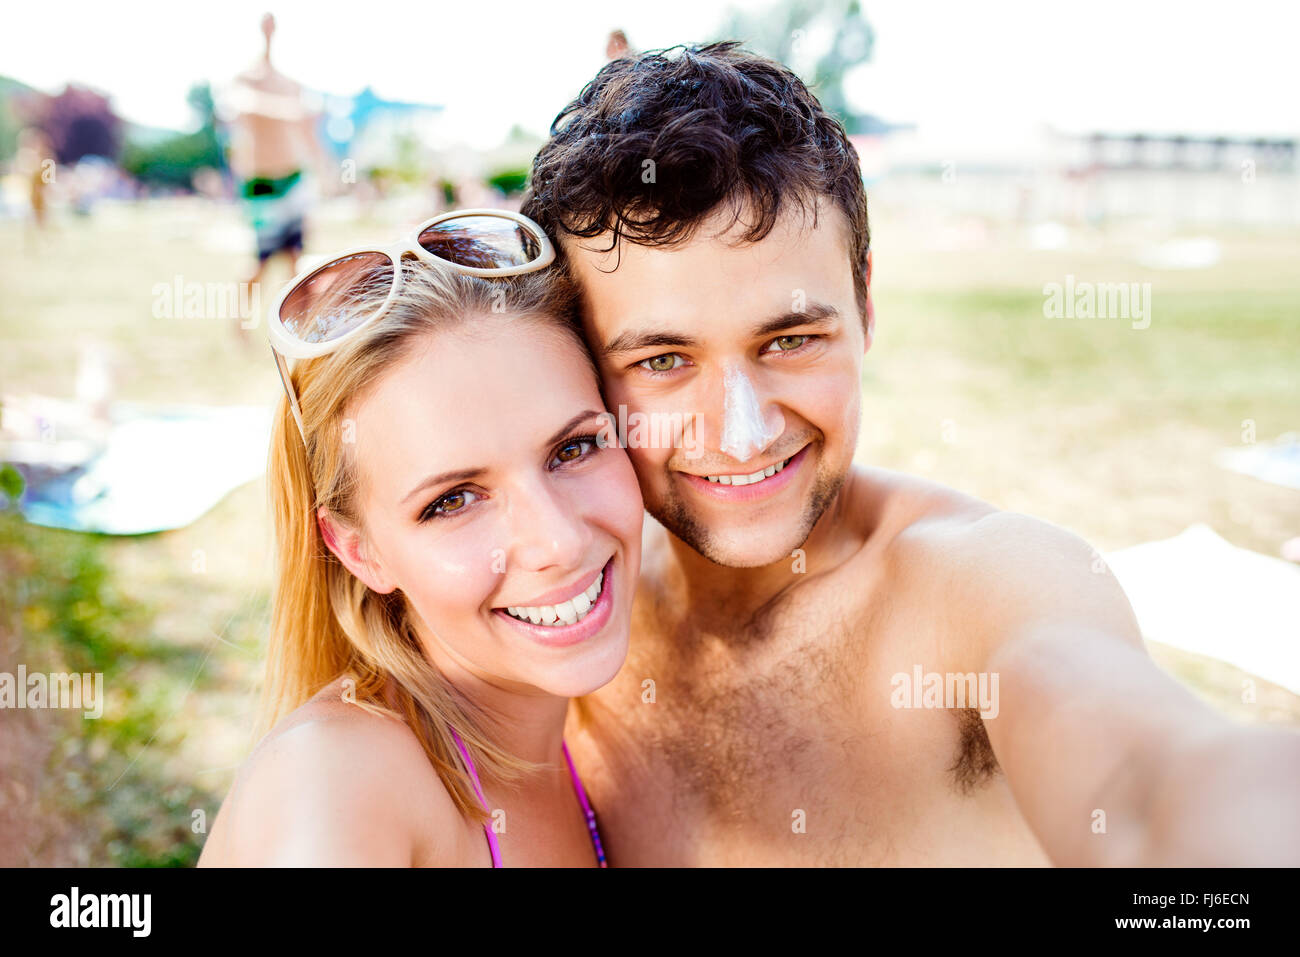 Junges Paar, Sonnenbaden, wobei Selfie. Sonnenschutz in der Nase. Stockbild